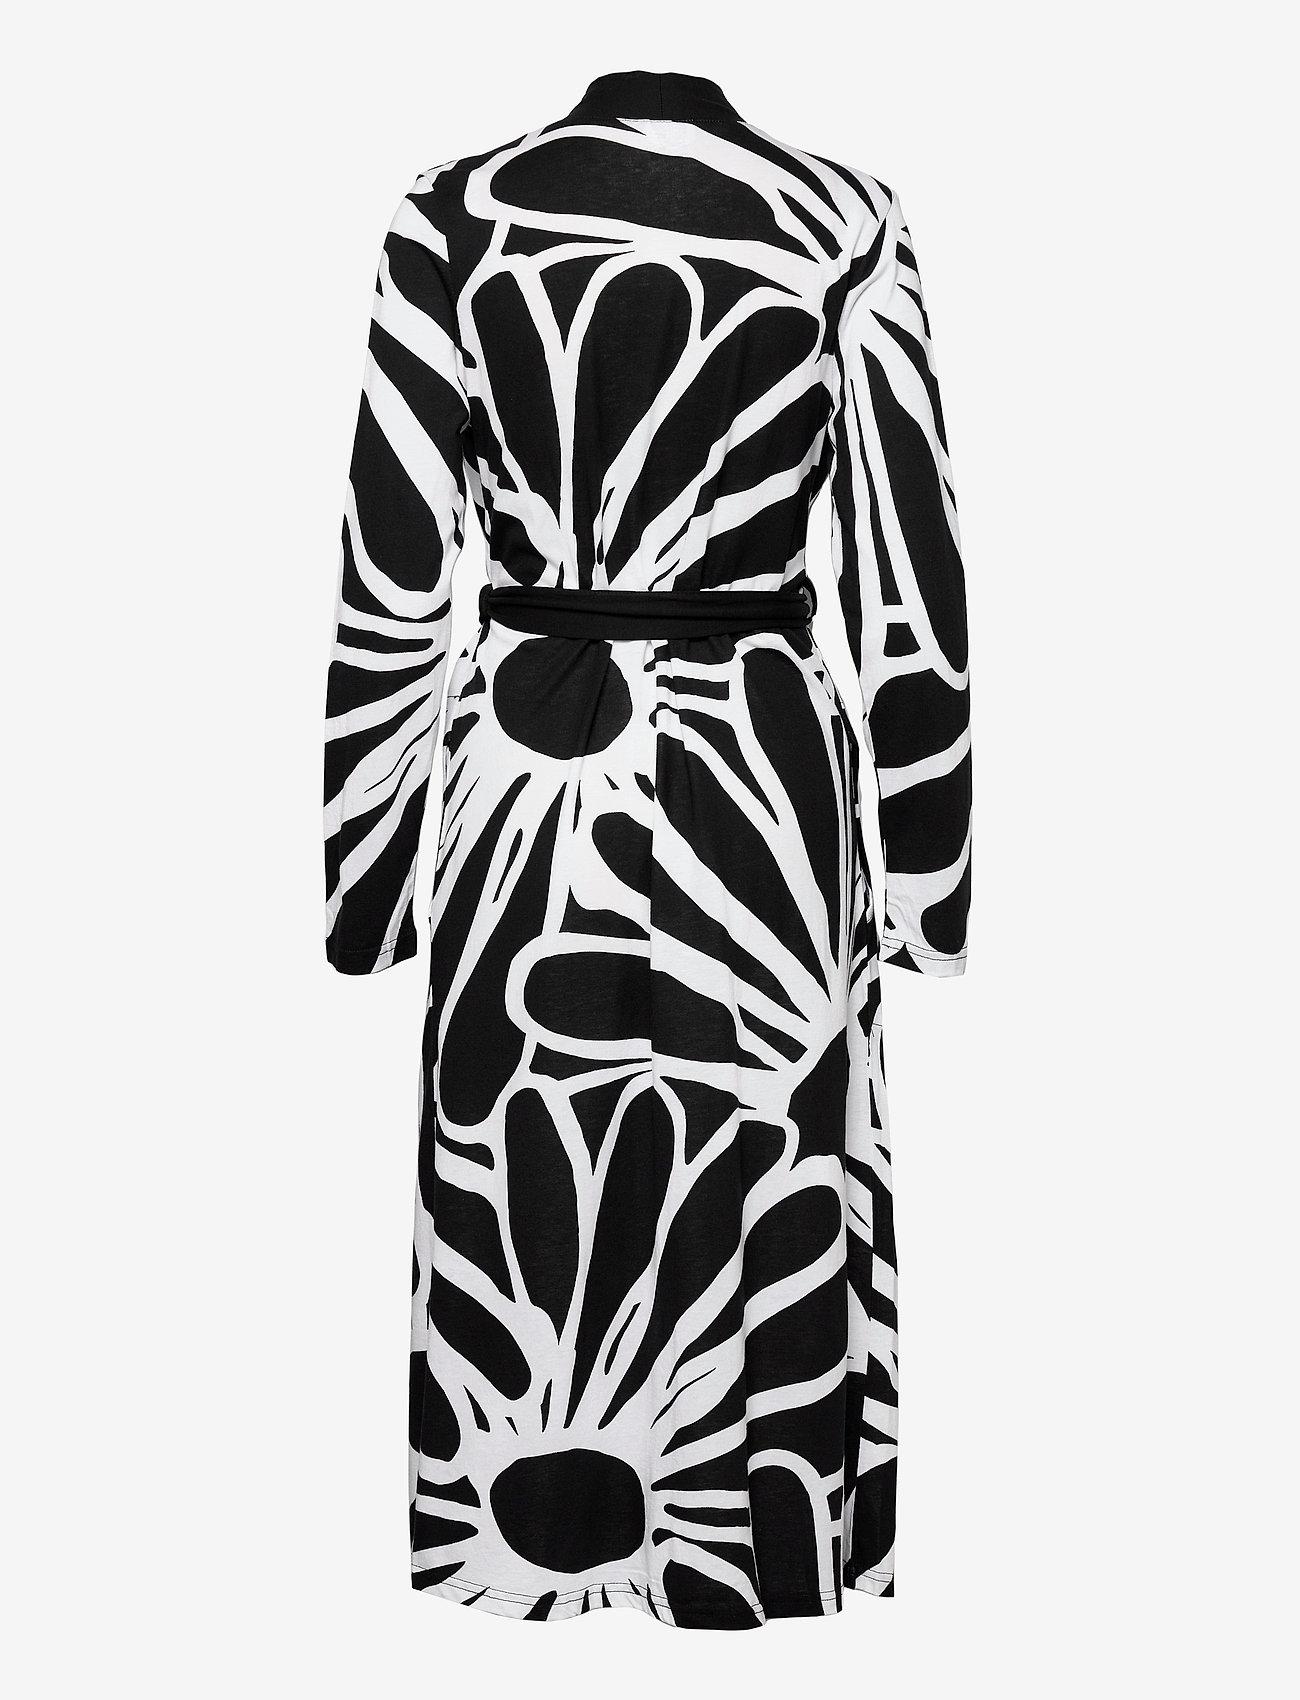 Nanso - Ladies dressing gown, Päivänkakkara - pegnoirs - black - 1